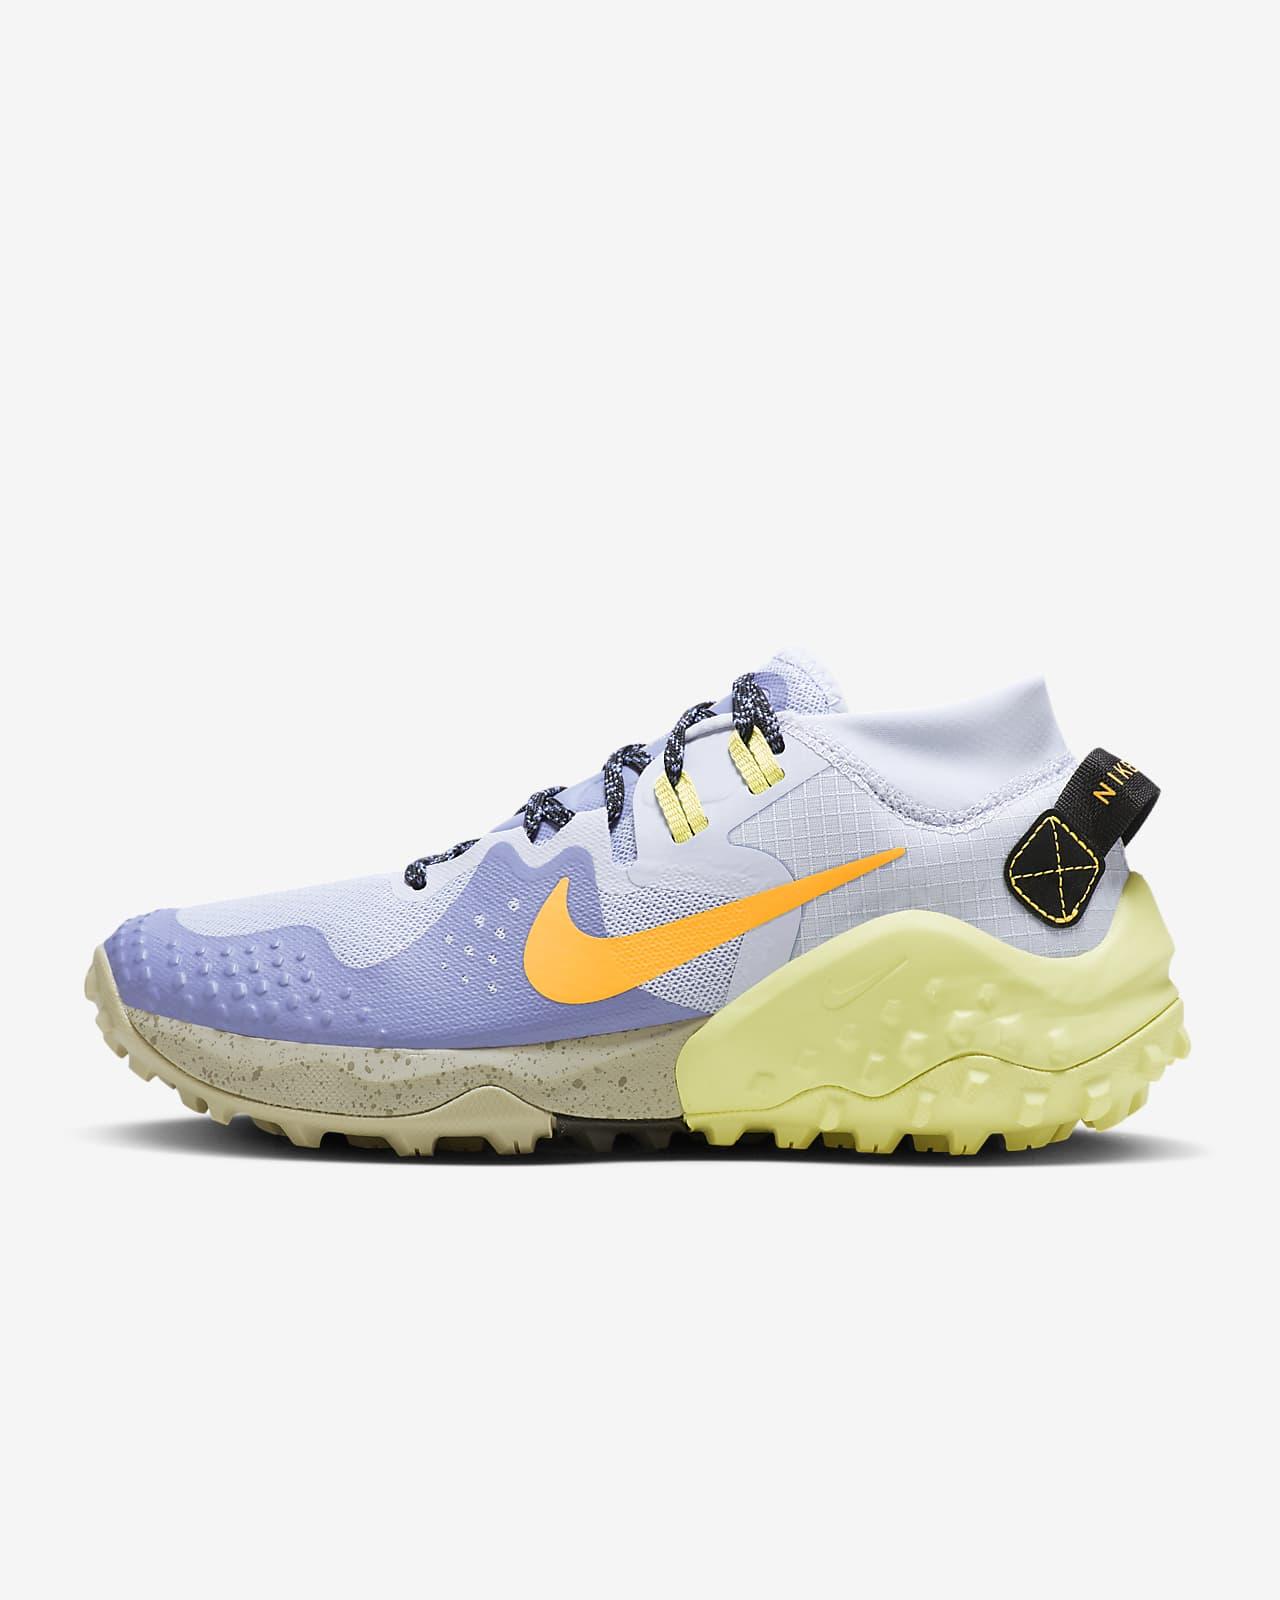 Dámská běžecká trailová bota Nike Wildhorse 6